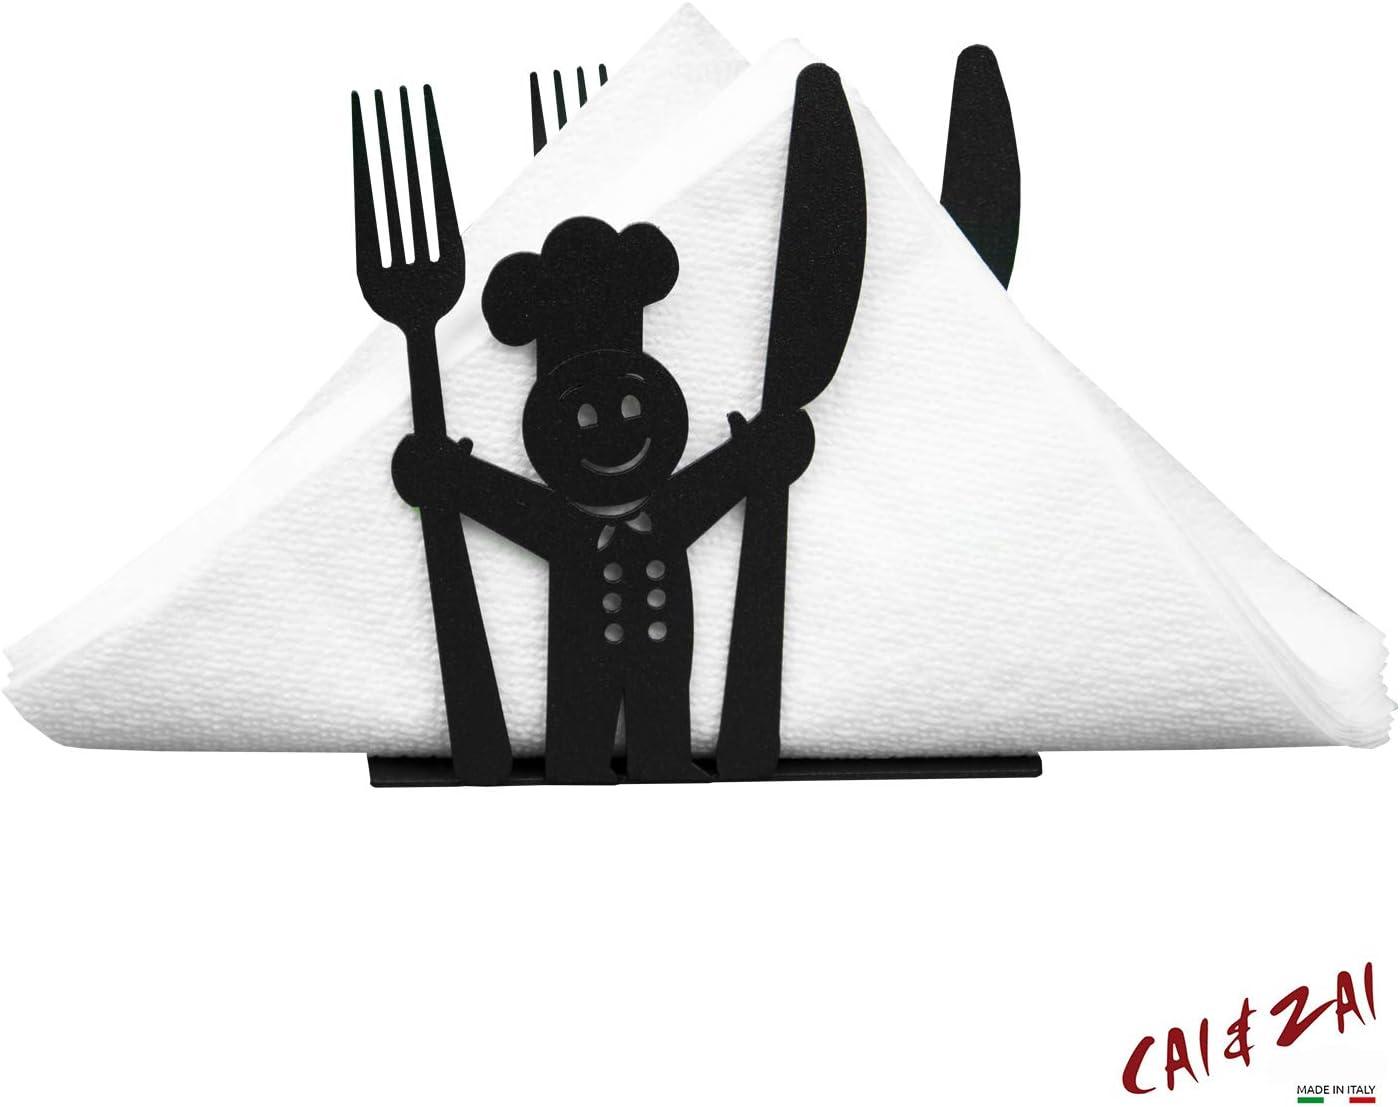 CAI /& ZAI-Set Cuoco-Portarrollos /& Servilletero-Dise/ño-Made in Itaty Portascittex